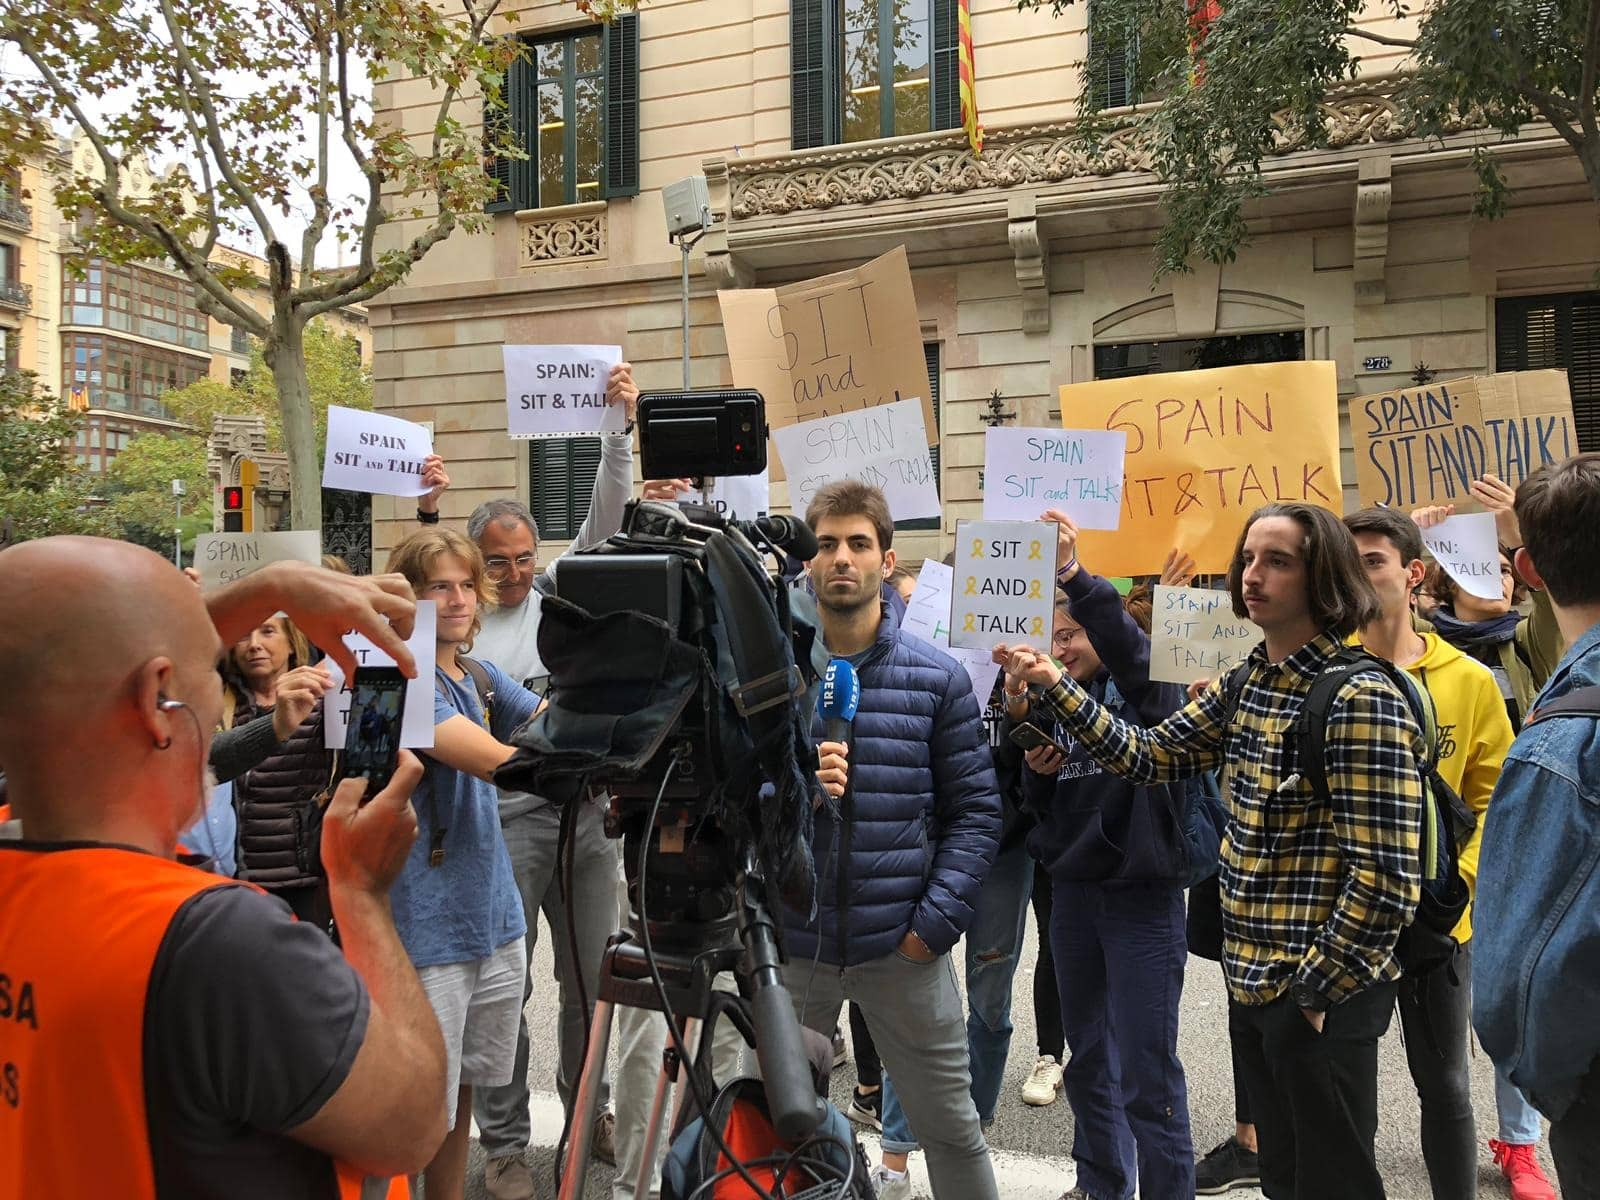 barcelone indépendantiste